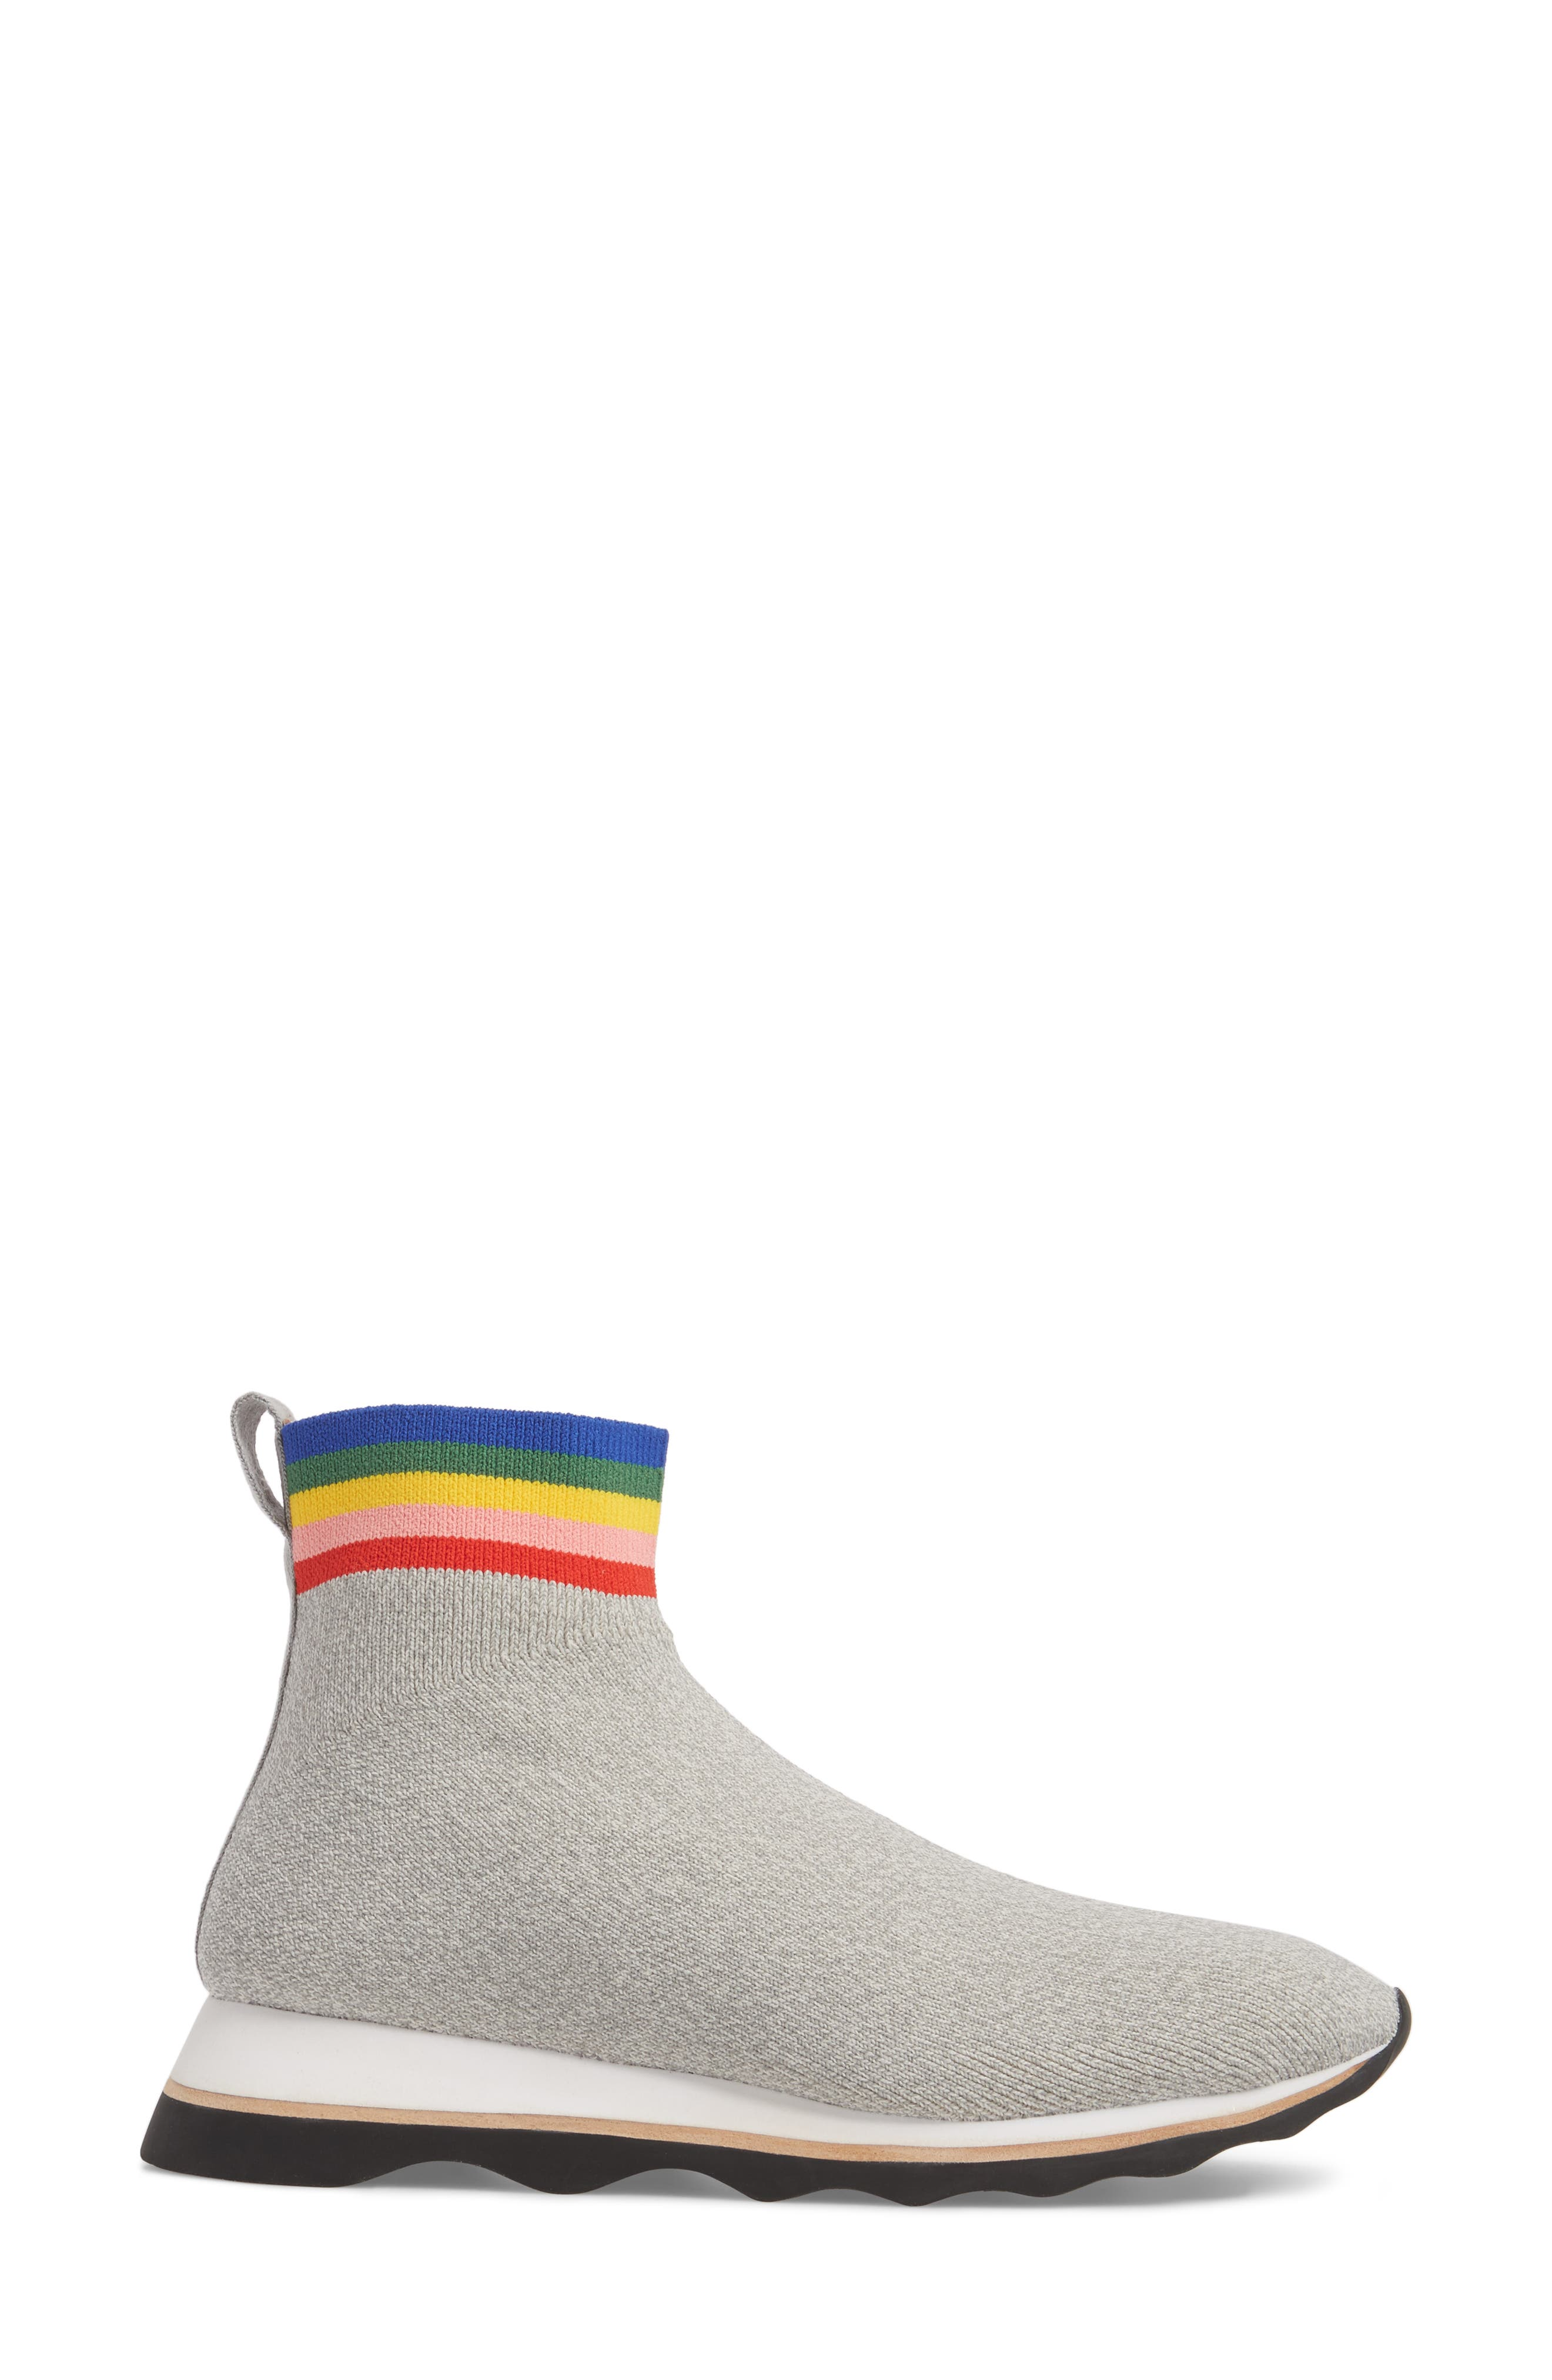 Alternate Image 3  - Loeffler Randall Scout Sock Sneaker (Women)